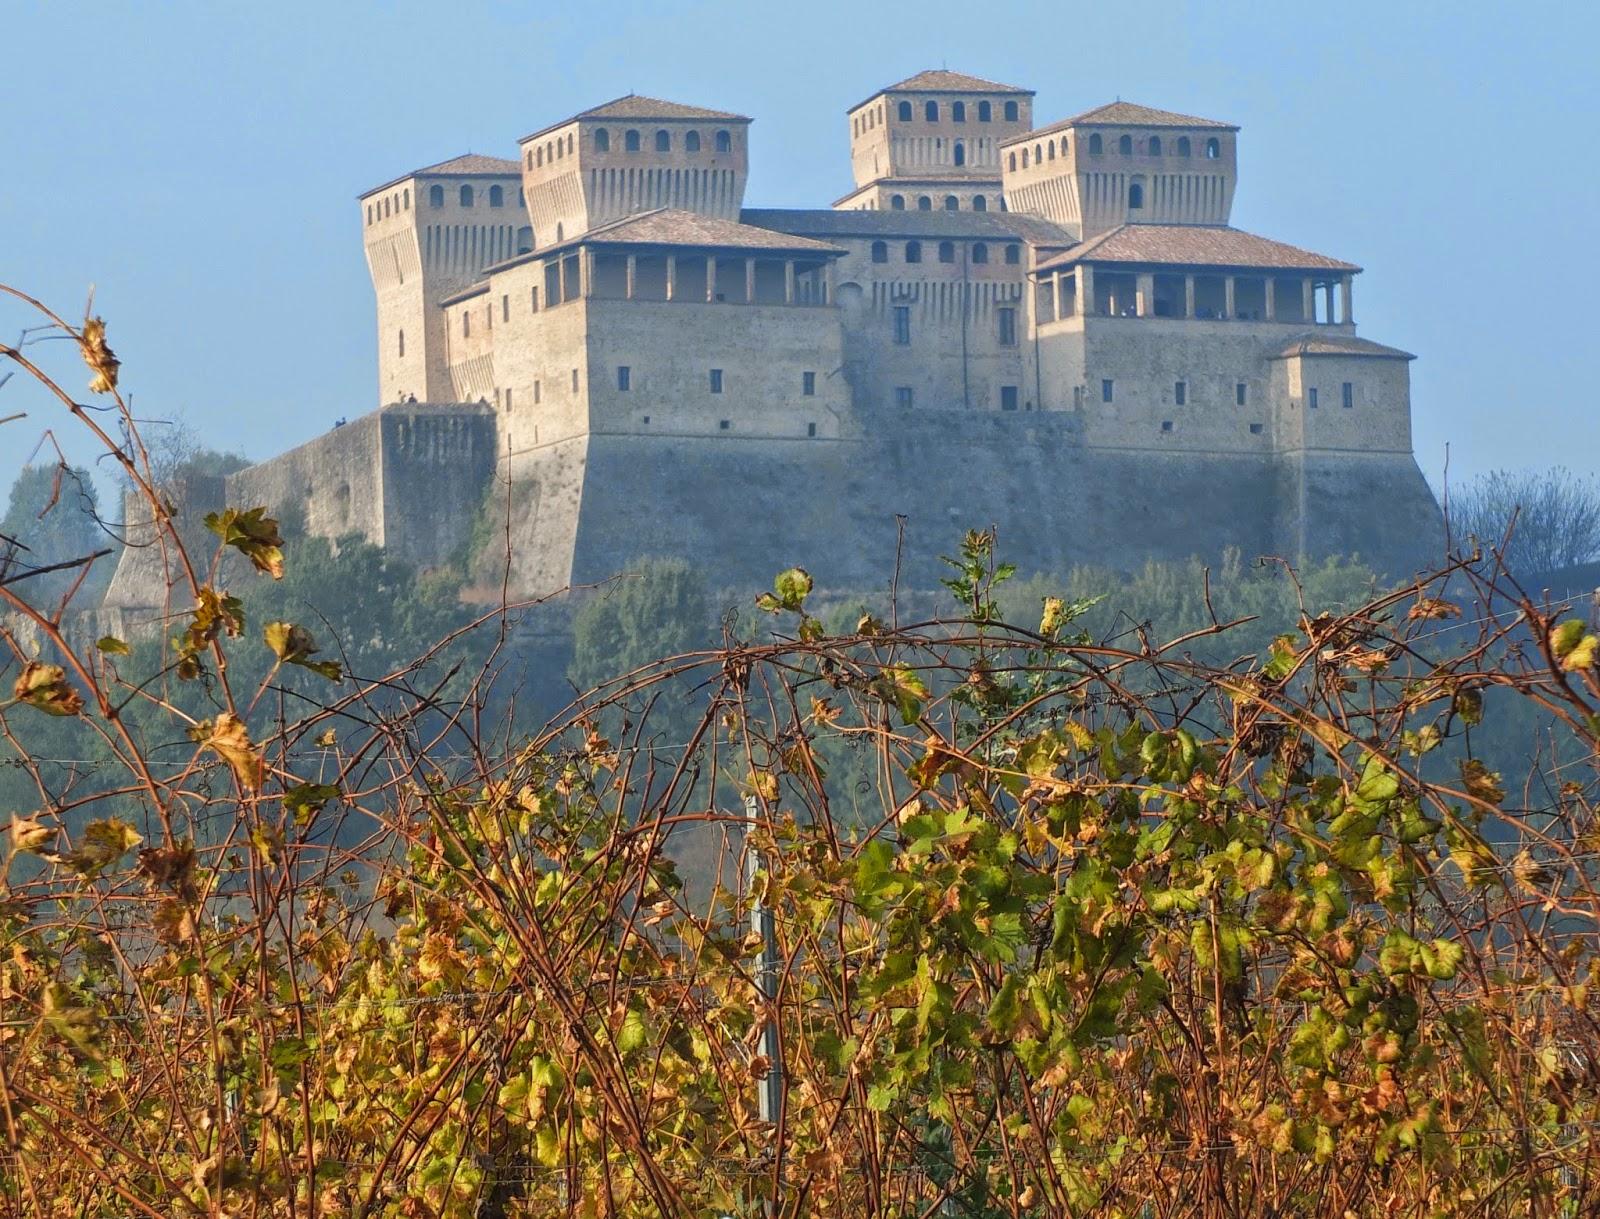 Torrechiara Castle near Parma